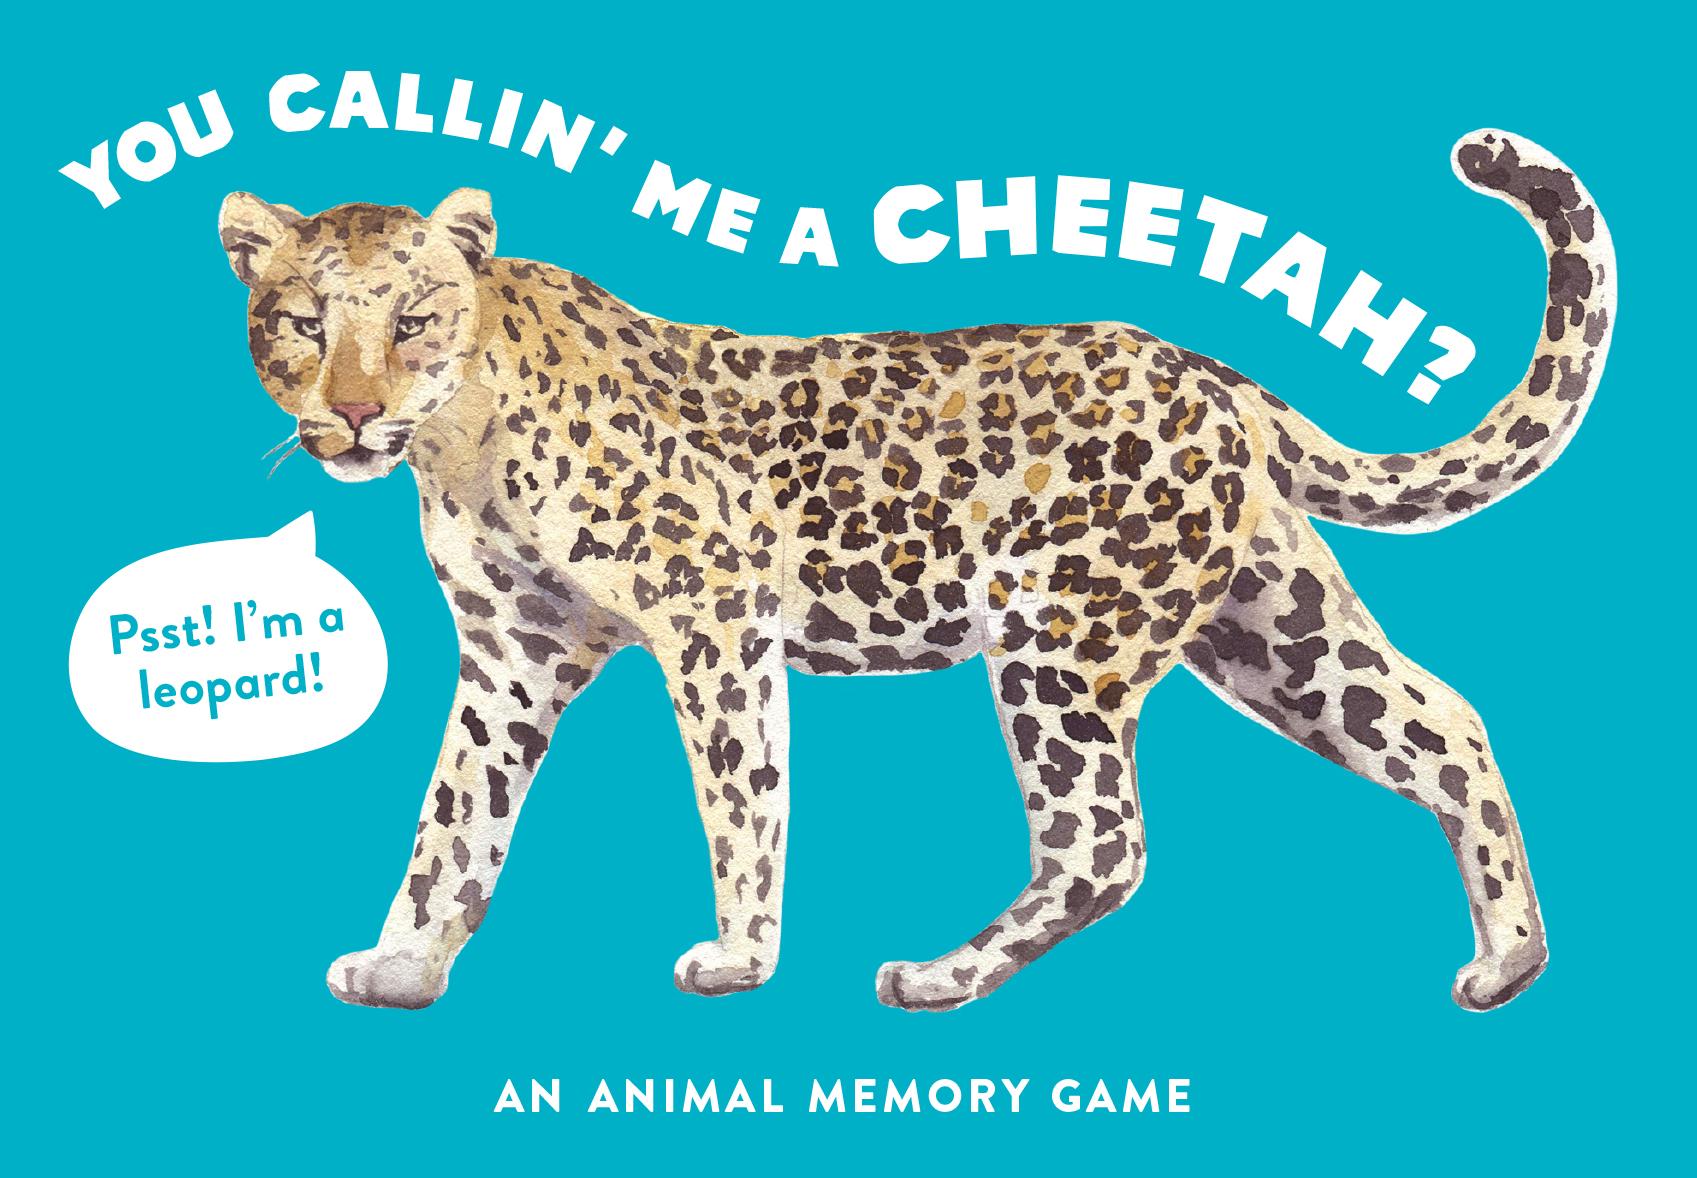 You Callin' Me a Cheetah? (Psst I'm a Leopard) - Product Thumbnail